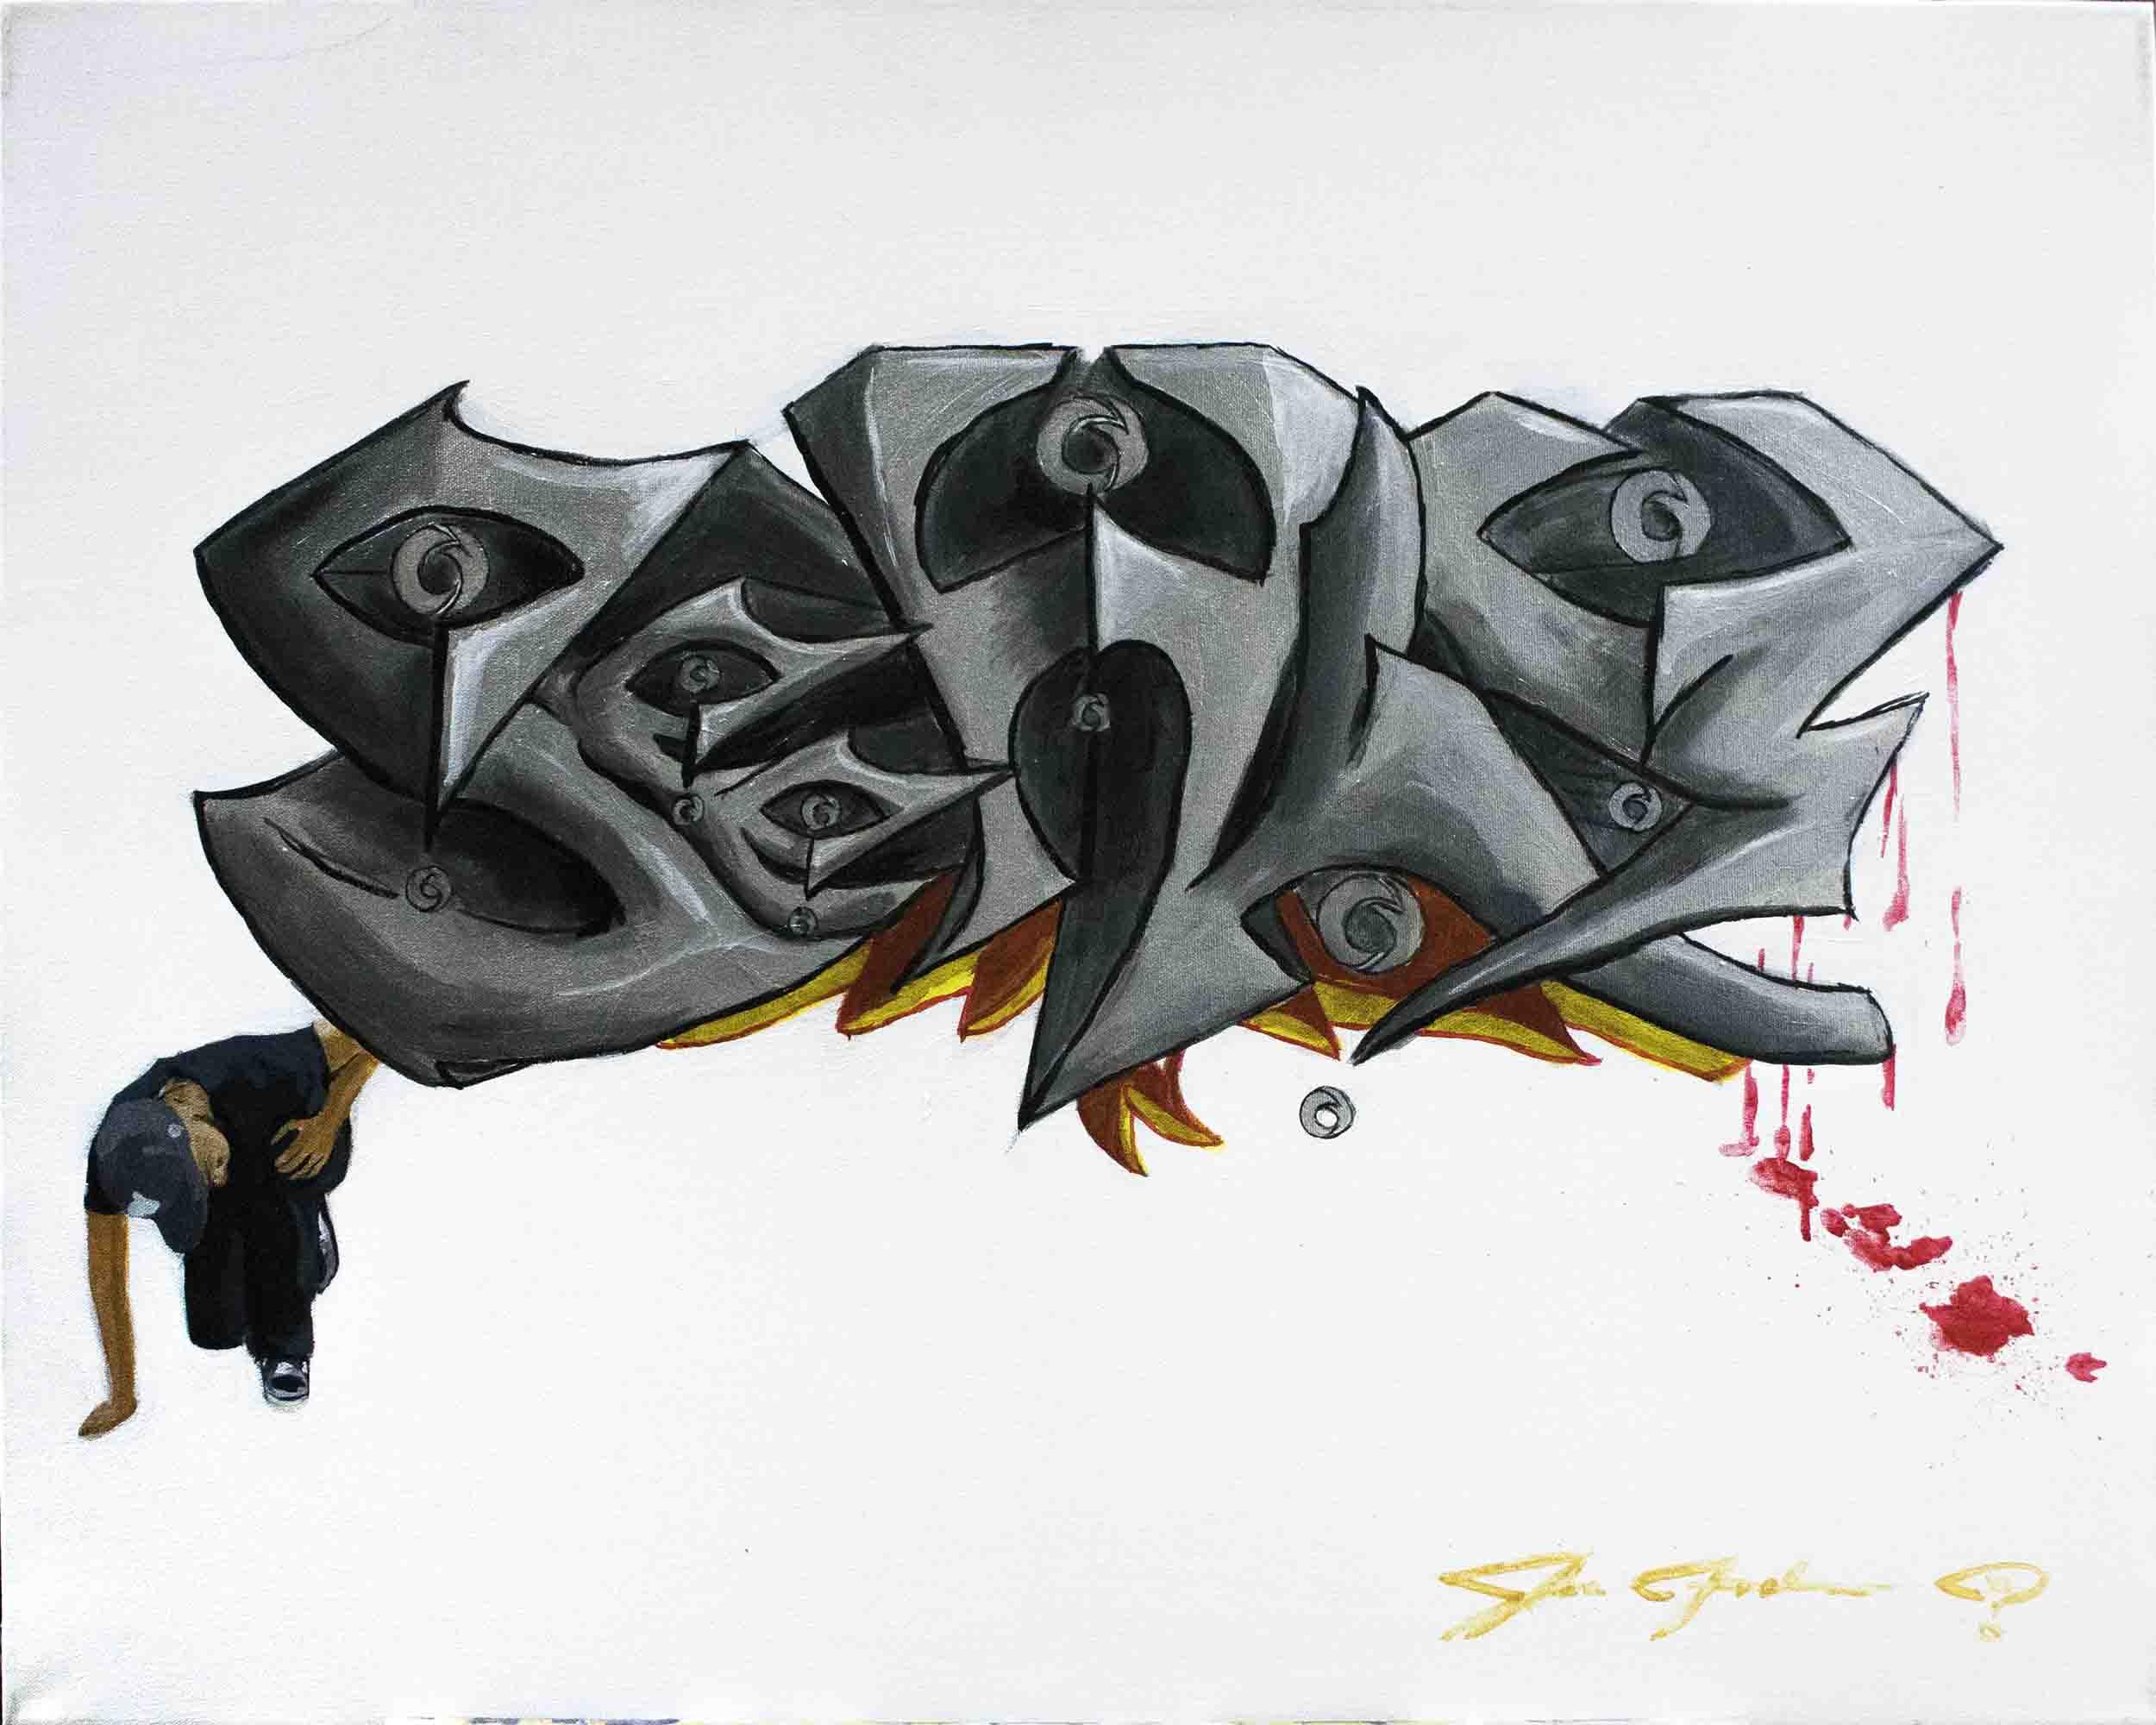 Super-Saturated pseudo-Graffiti - front